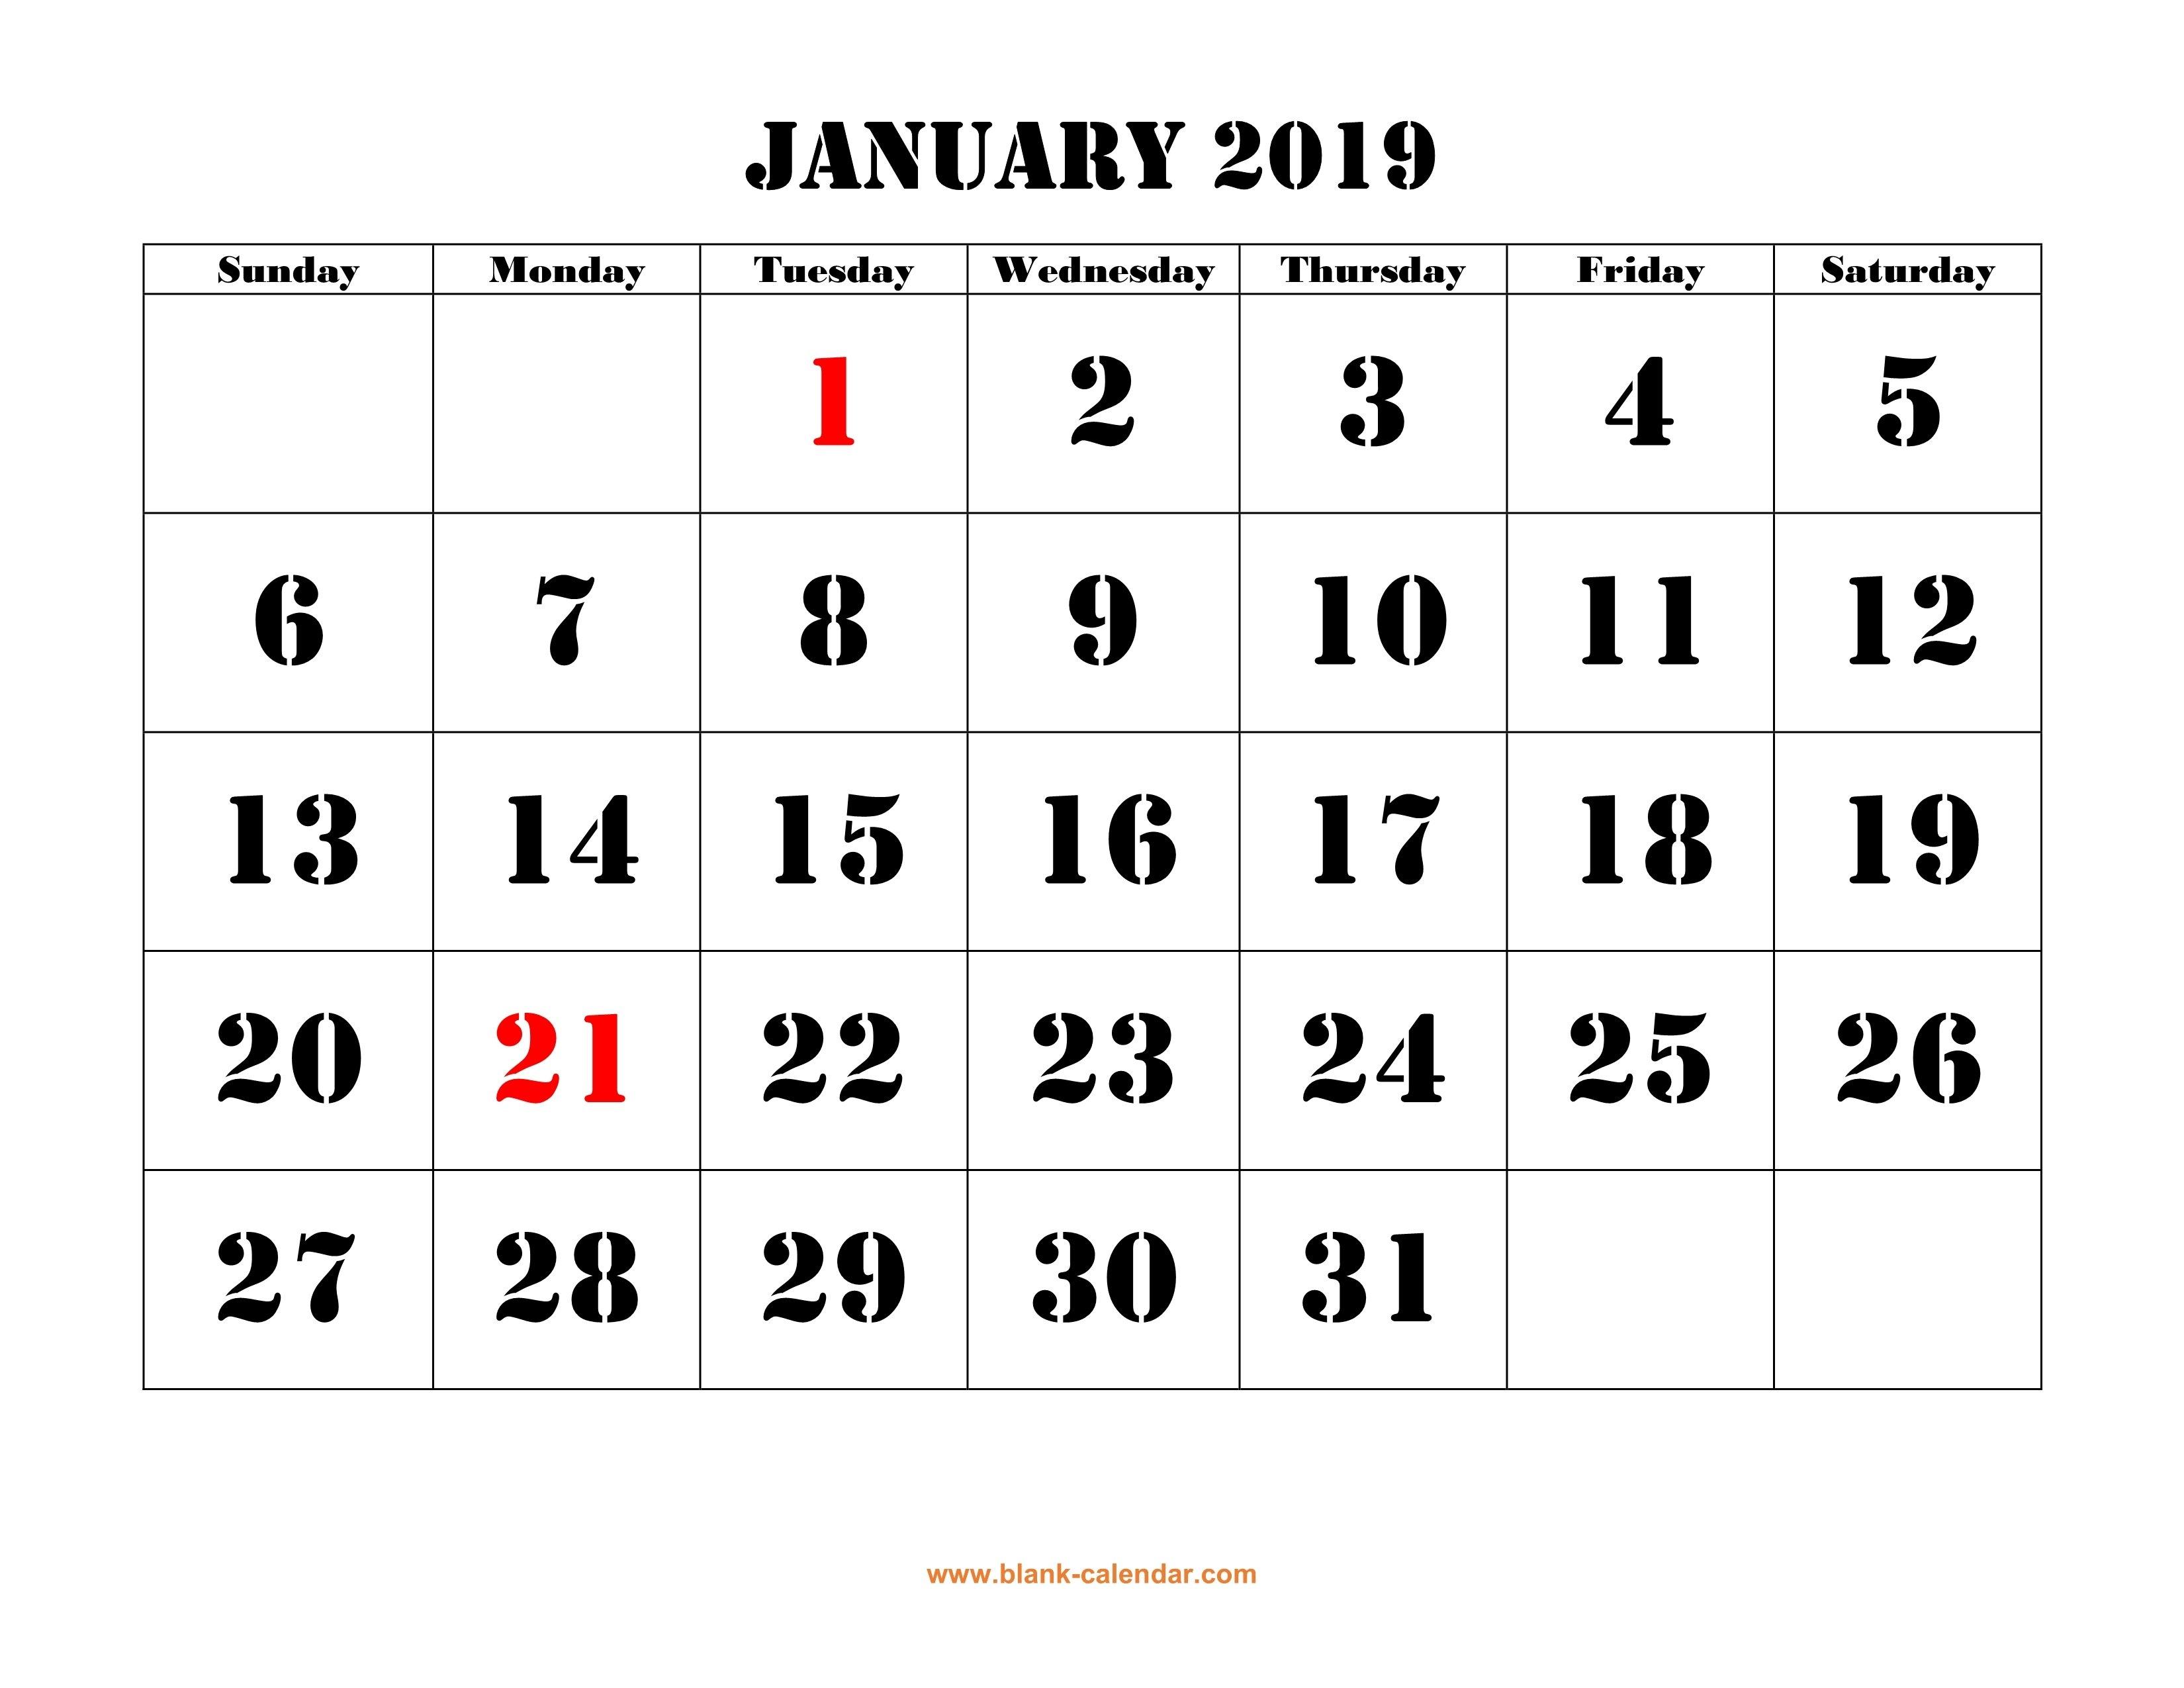 Free Download Printable January 2019 Calendar, Large Font Design January 8 2019 Calendar